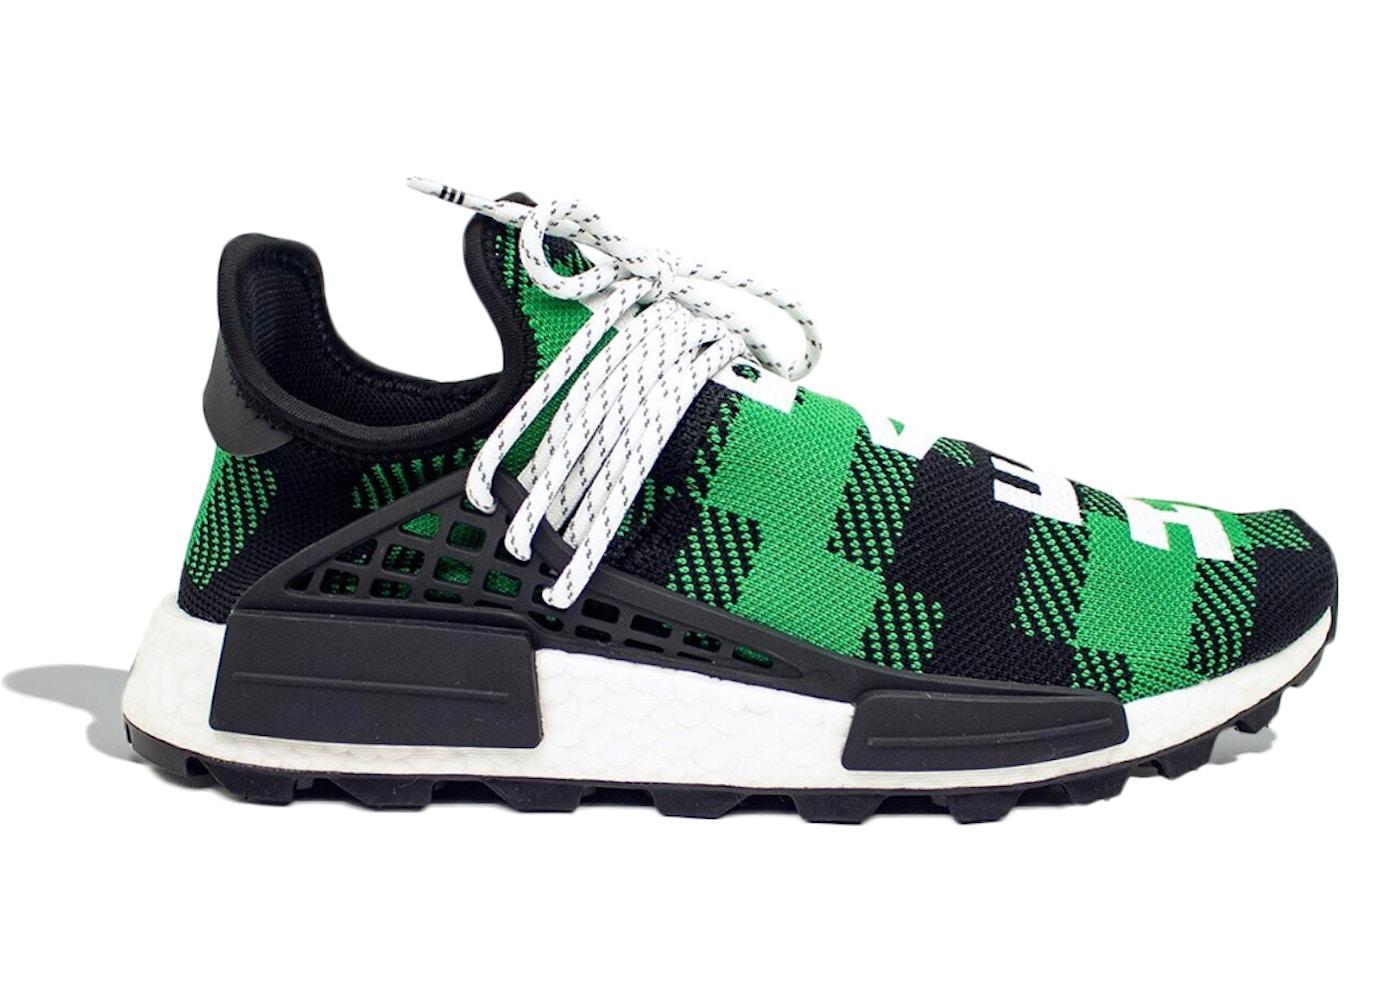 9ec78866 StockX: Buy and Sell Sneakers, Streetwear, Handbags, Watches